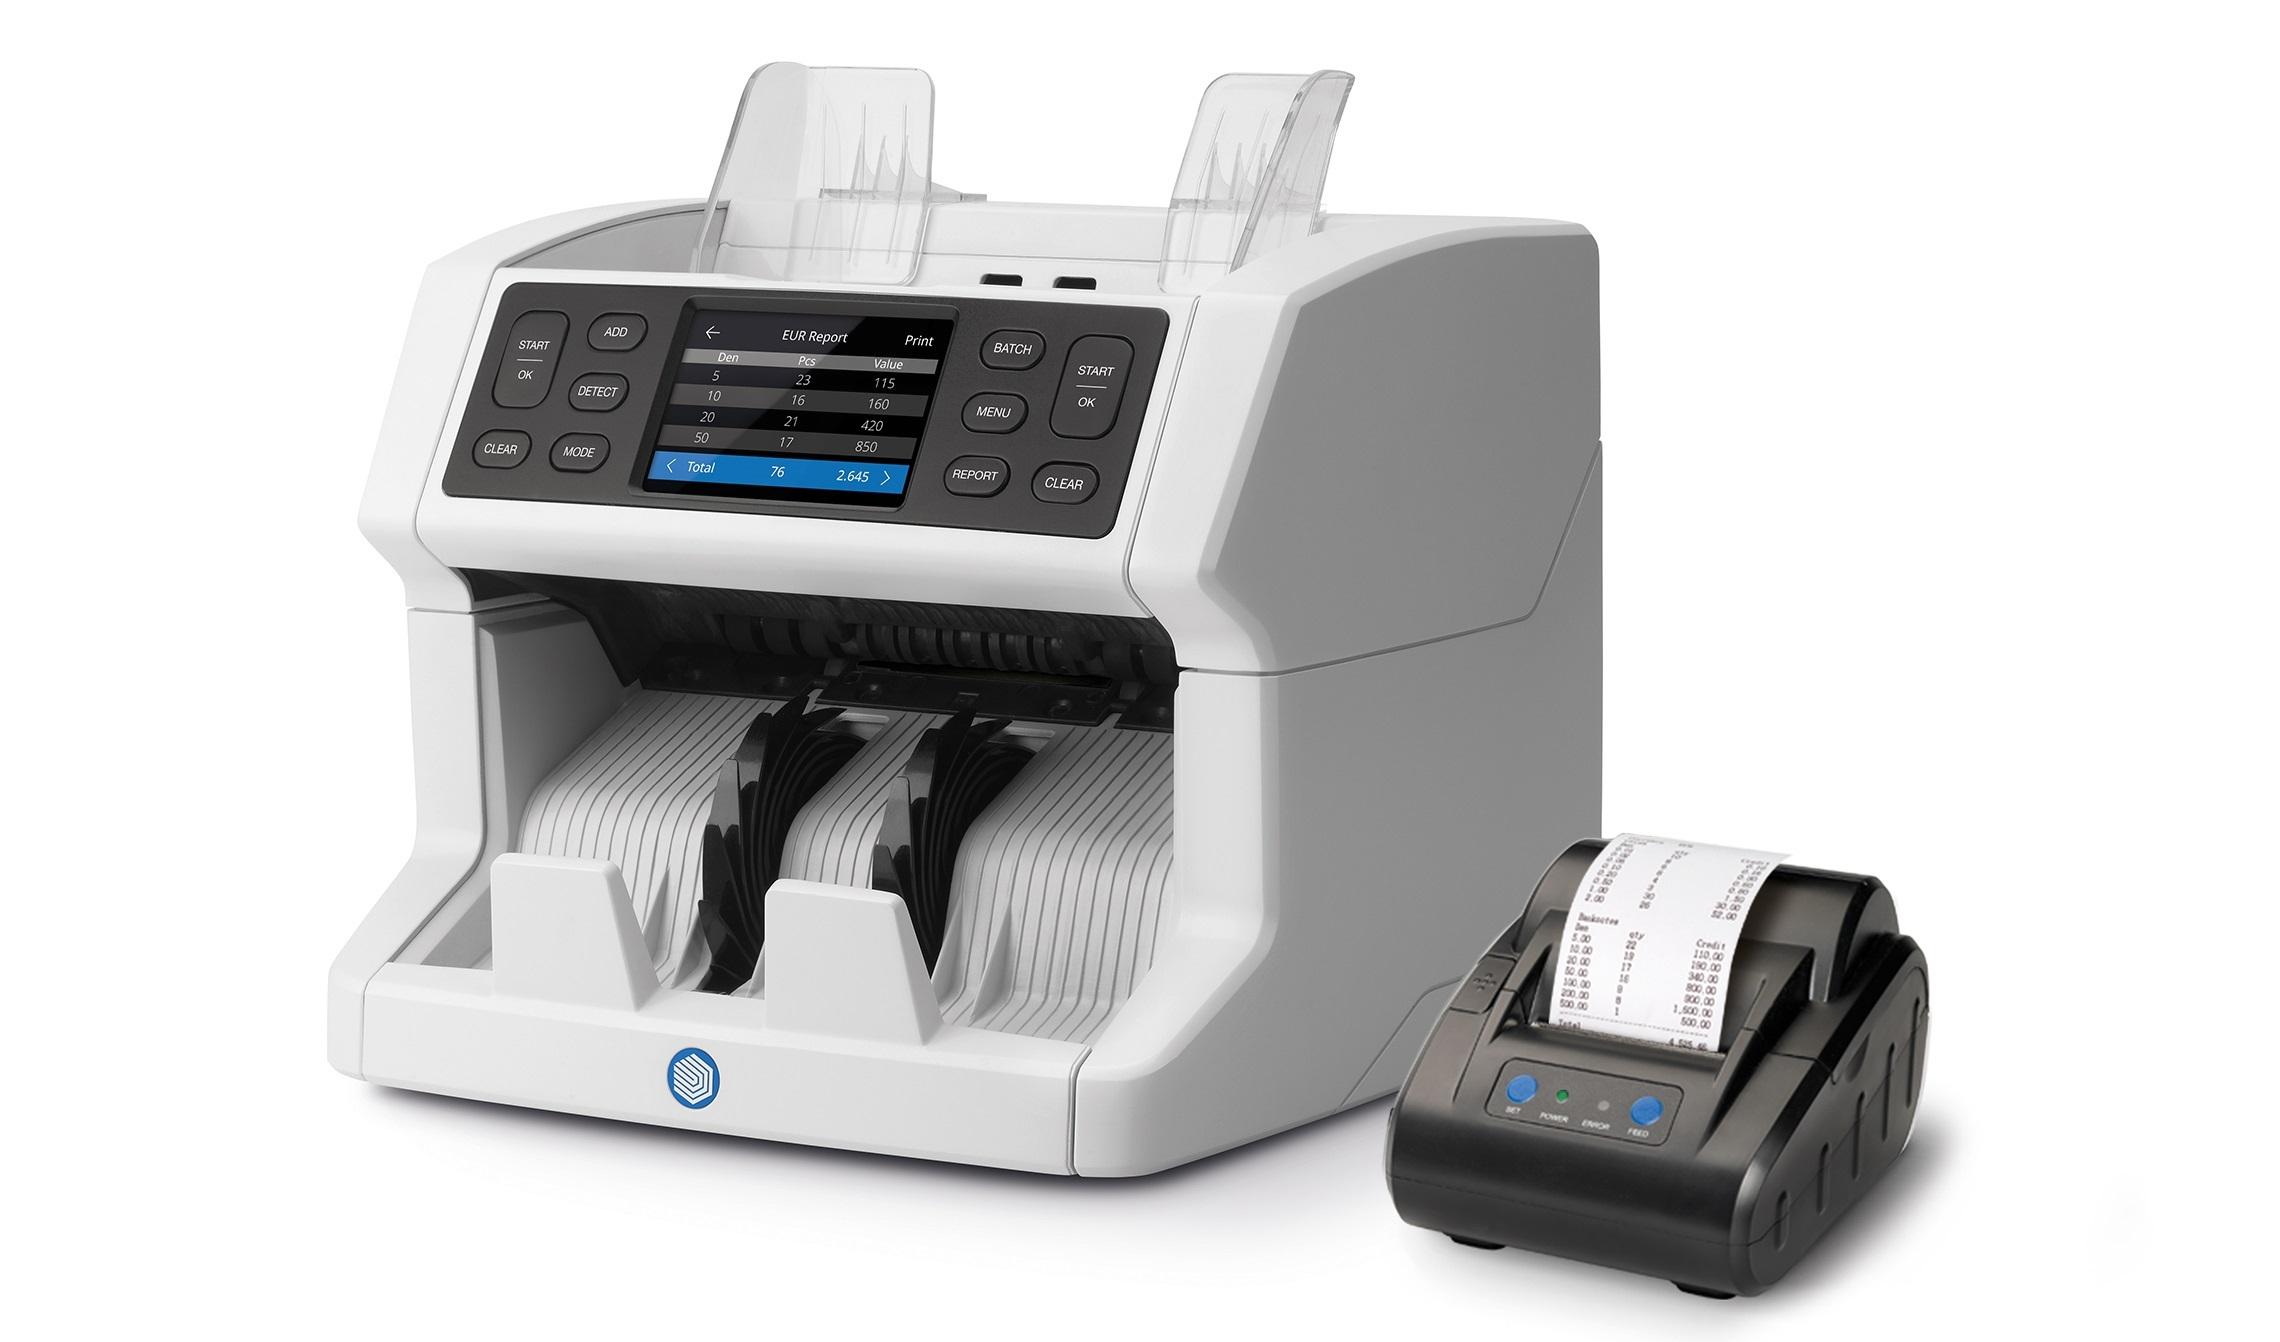 safescan-tp-230-thermal-printer